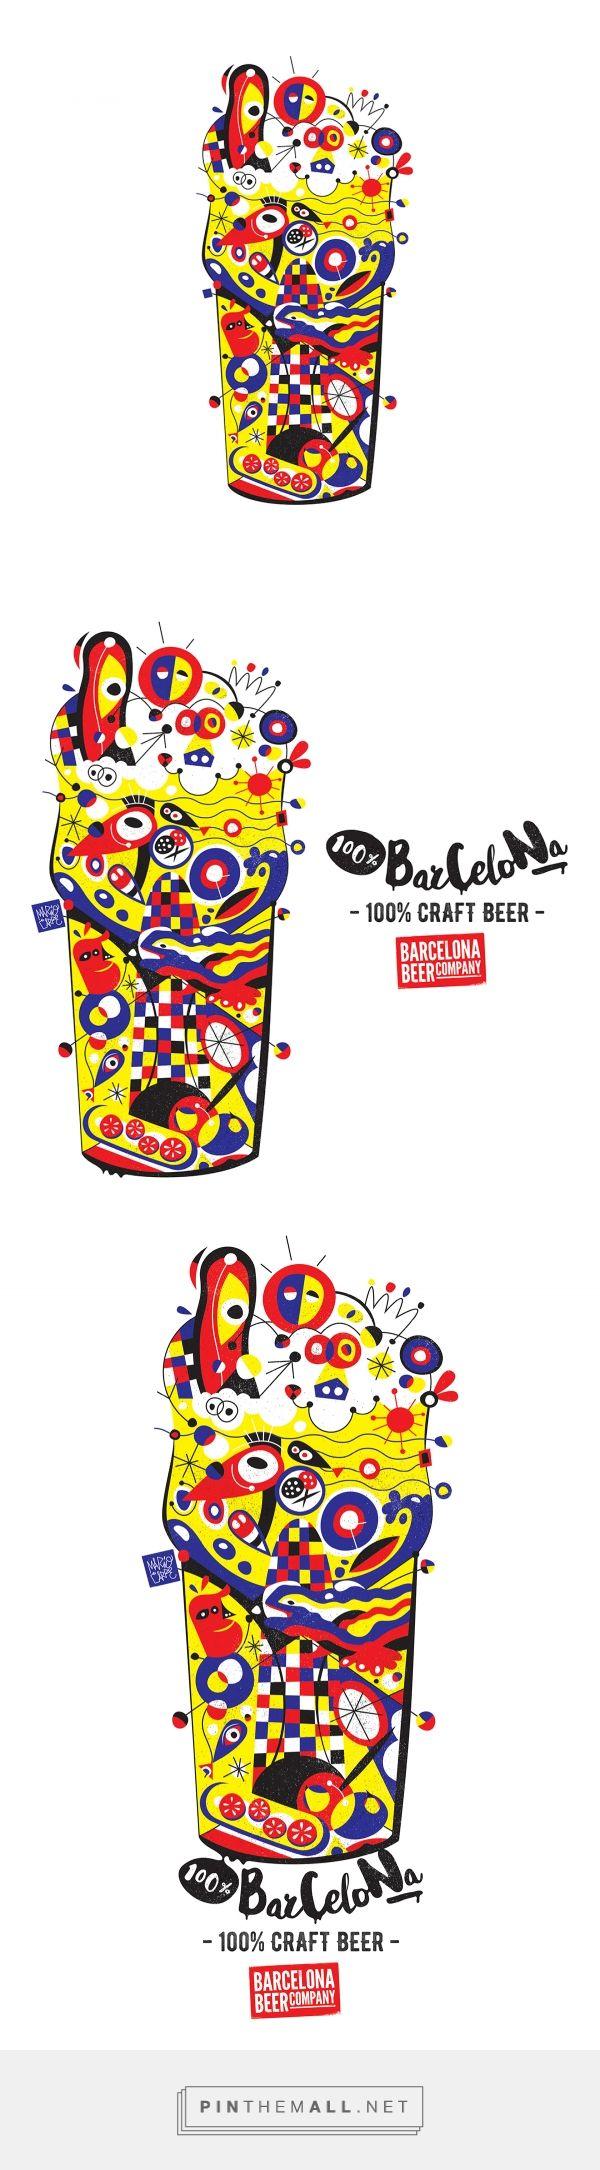 Barcelona Beer Company on Behance - created via https://pinthemall.net